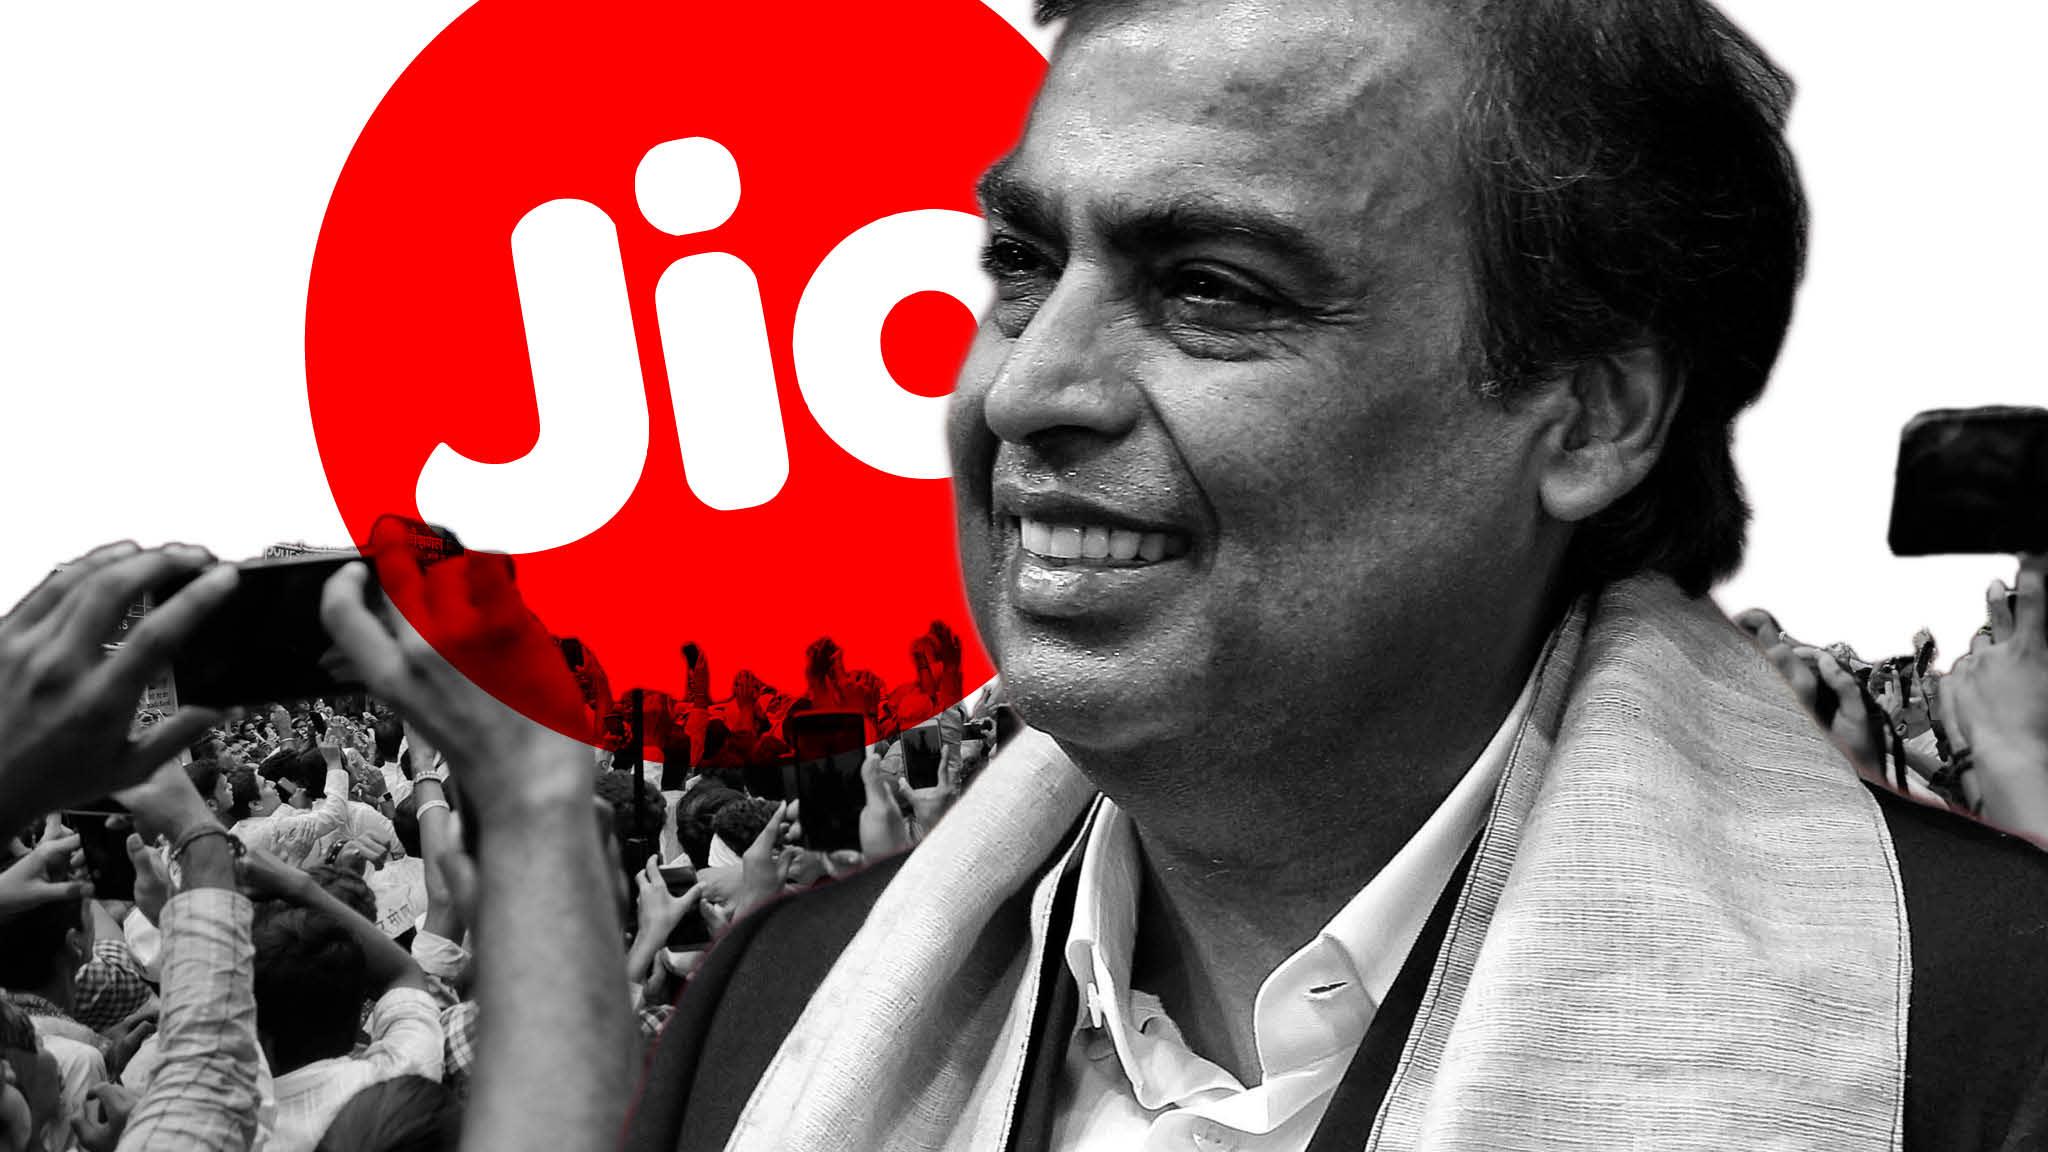 India: The creation of a mobile phone juggernaut